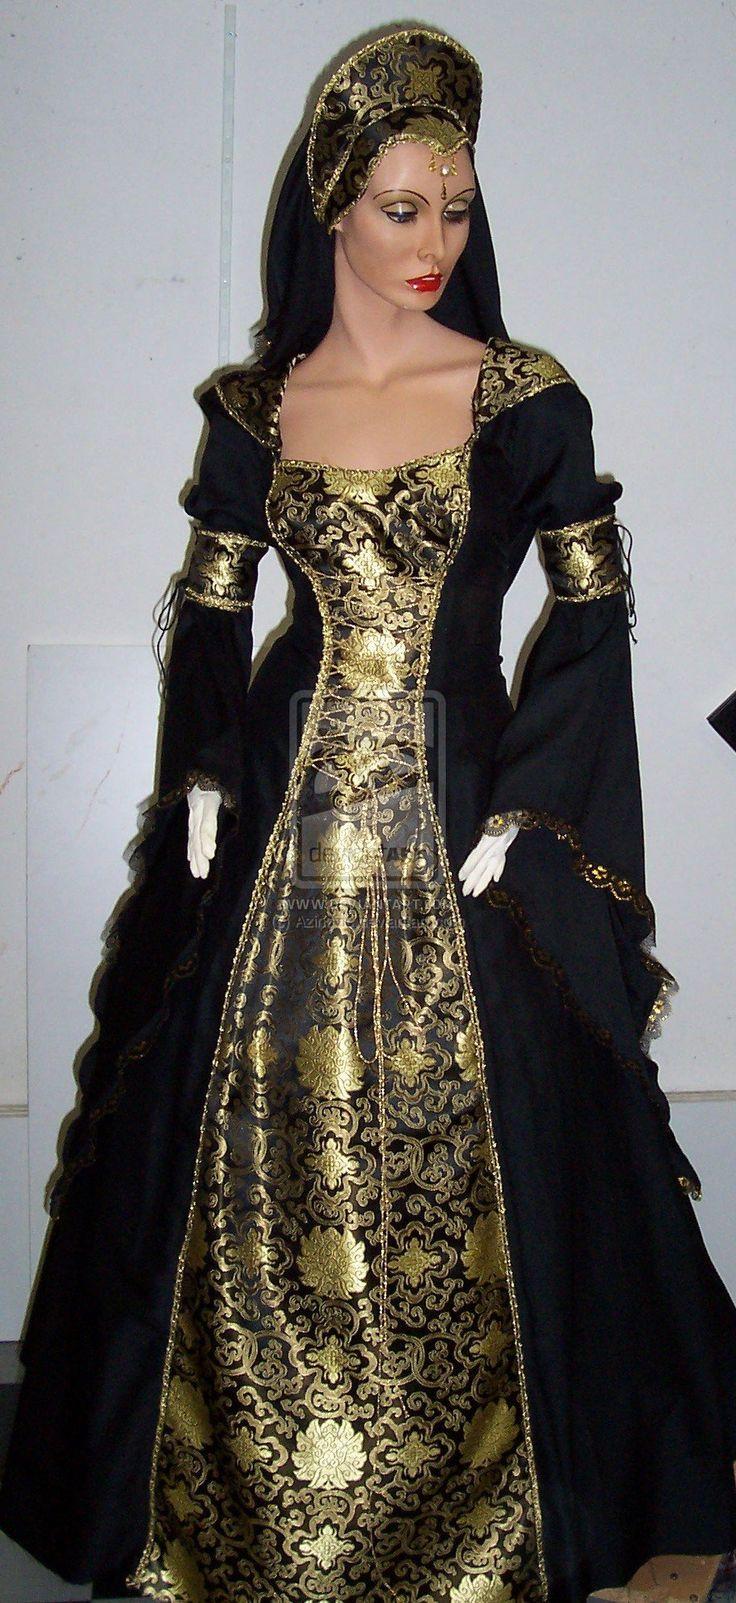 Black-gold dress by Azinovic.deviantart.com on @deviantART I like particulary this one